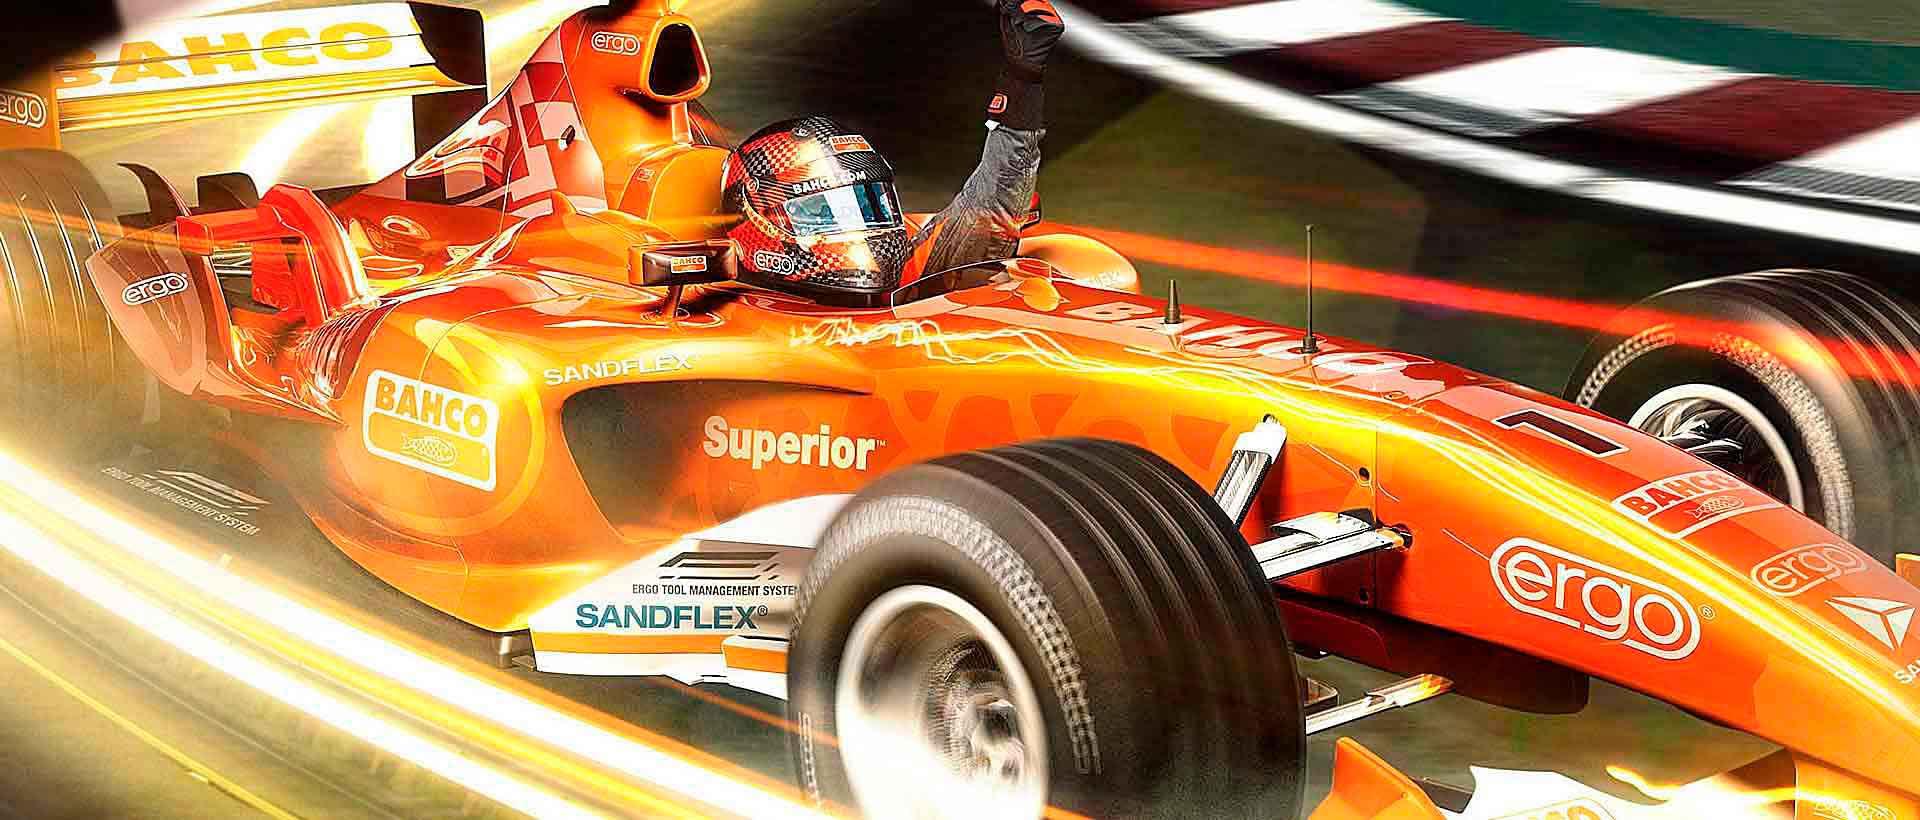 F1 Car - Bahco